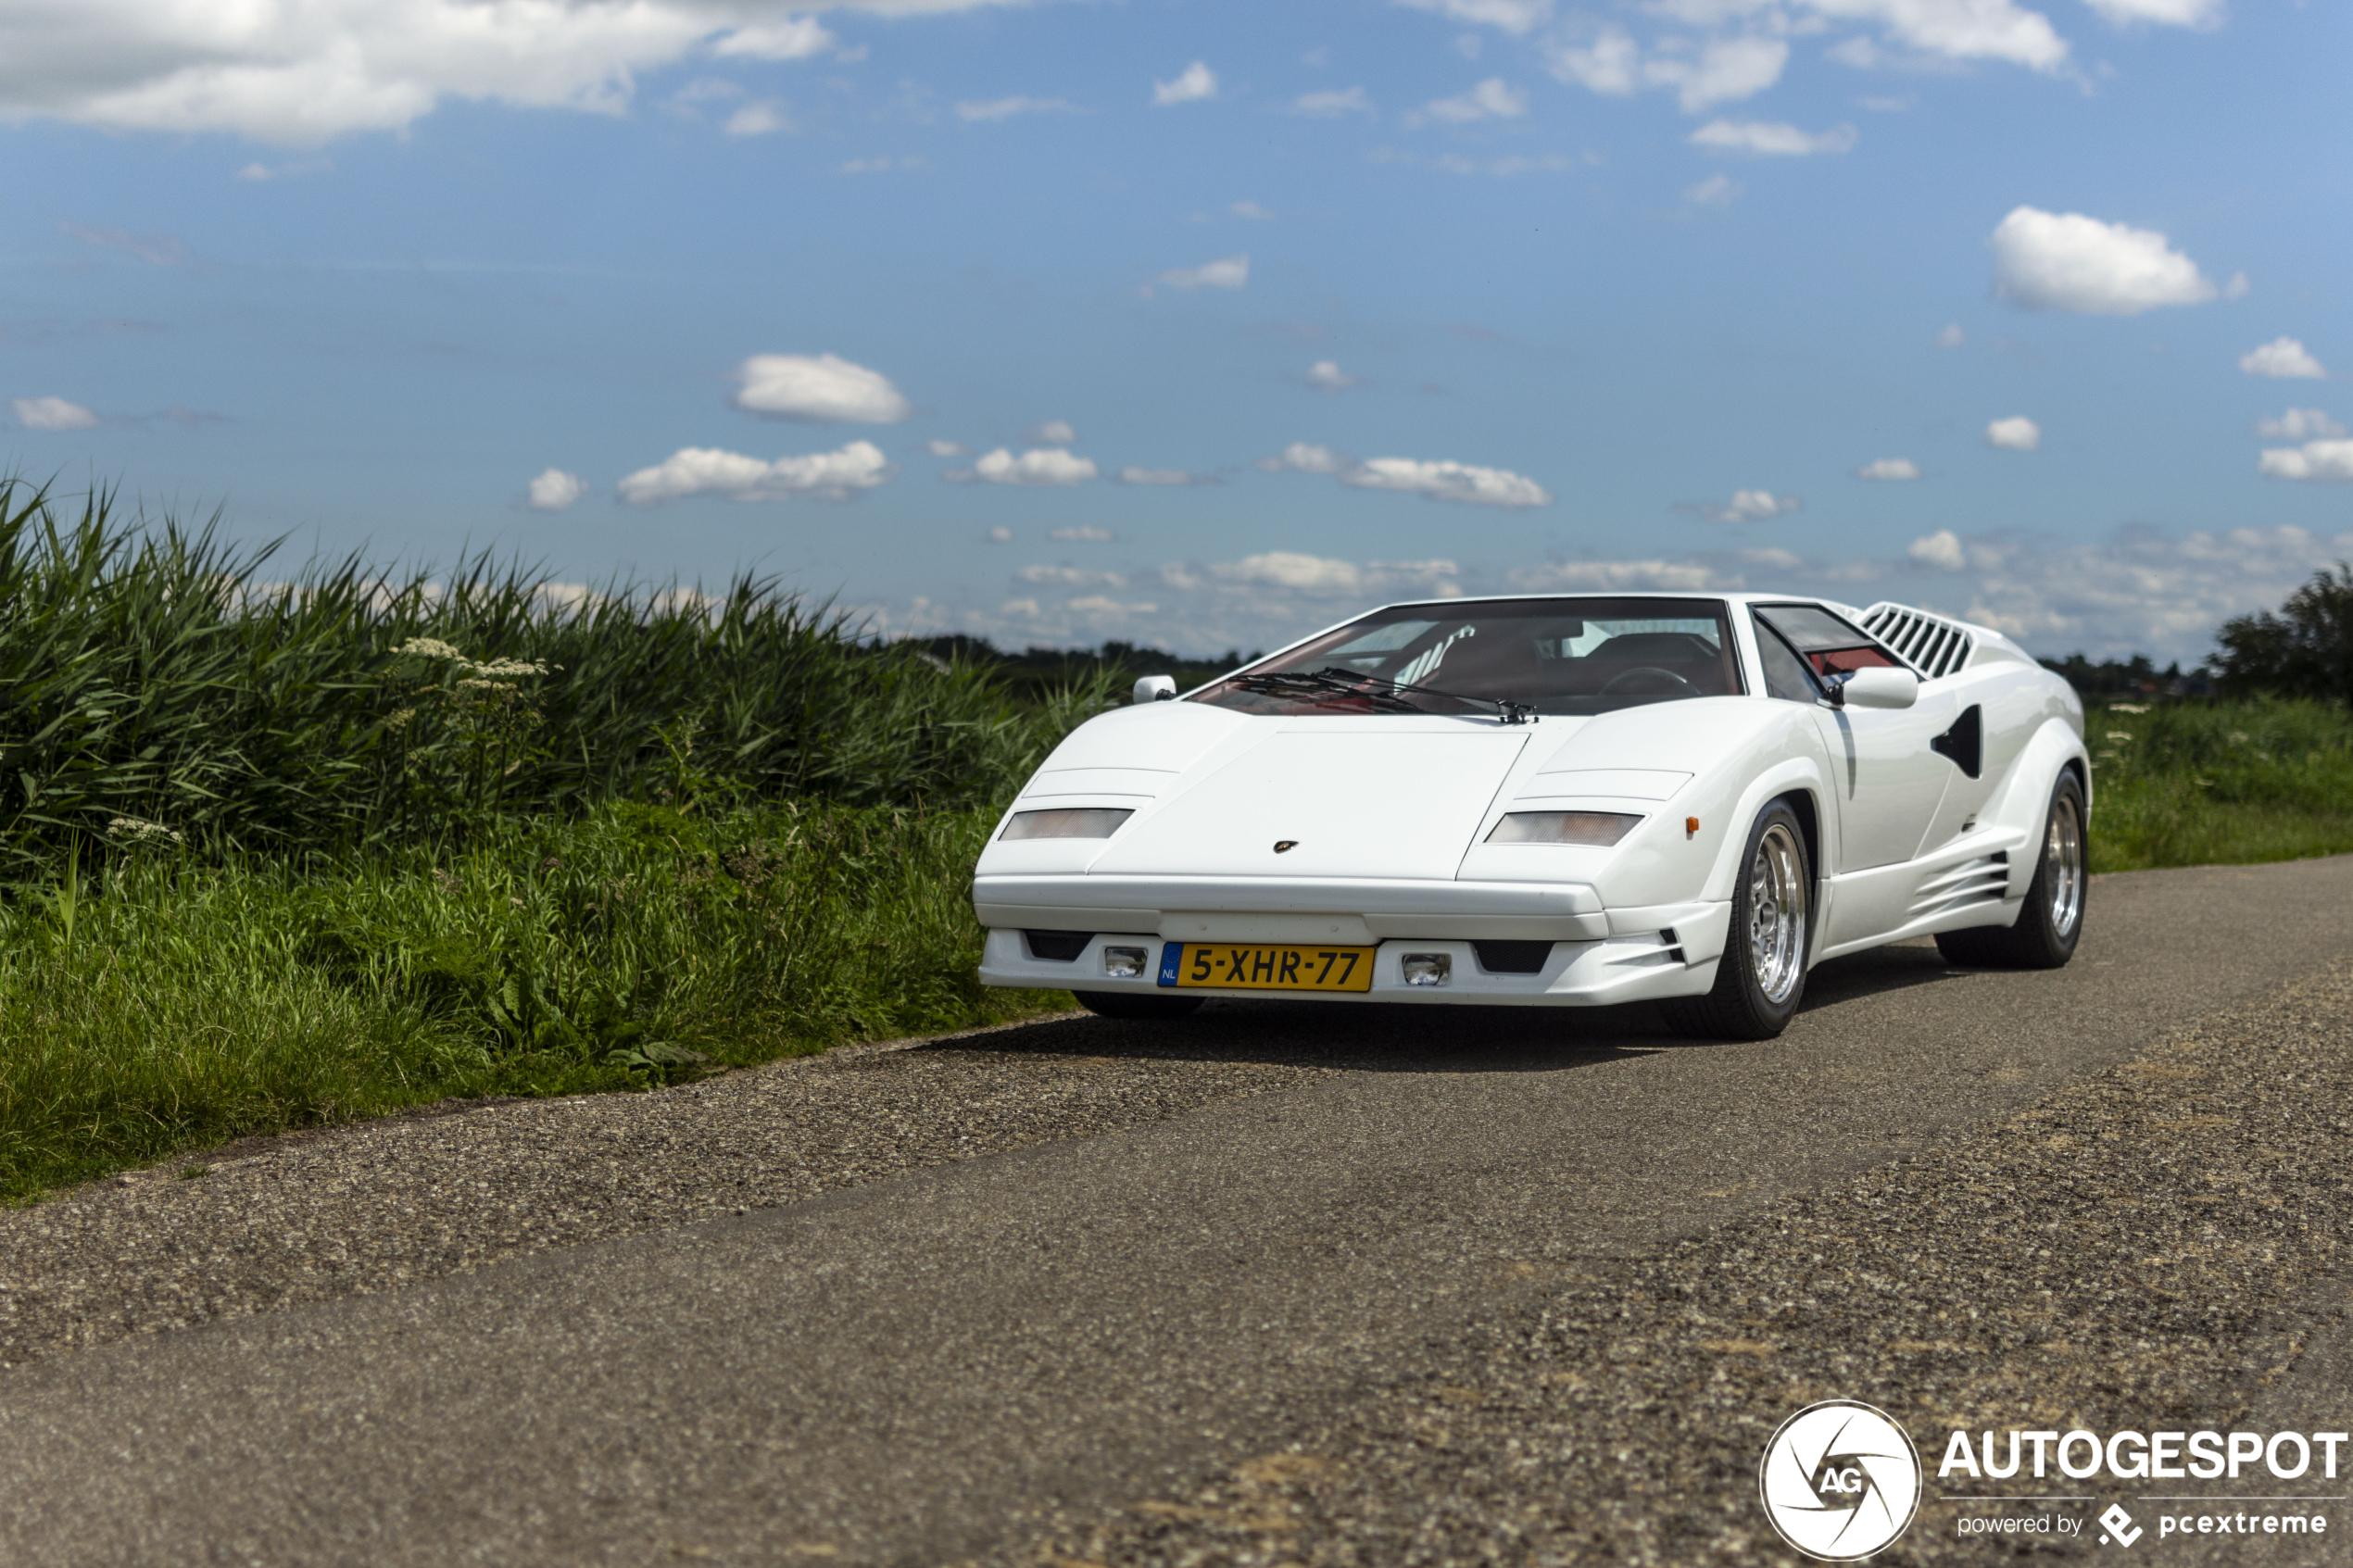 Spot van de dag: Lamborghini Countach 25th Anniversary